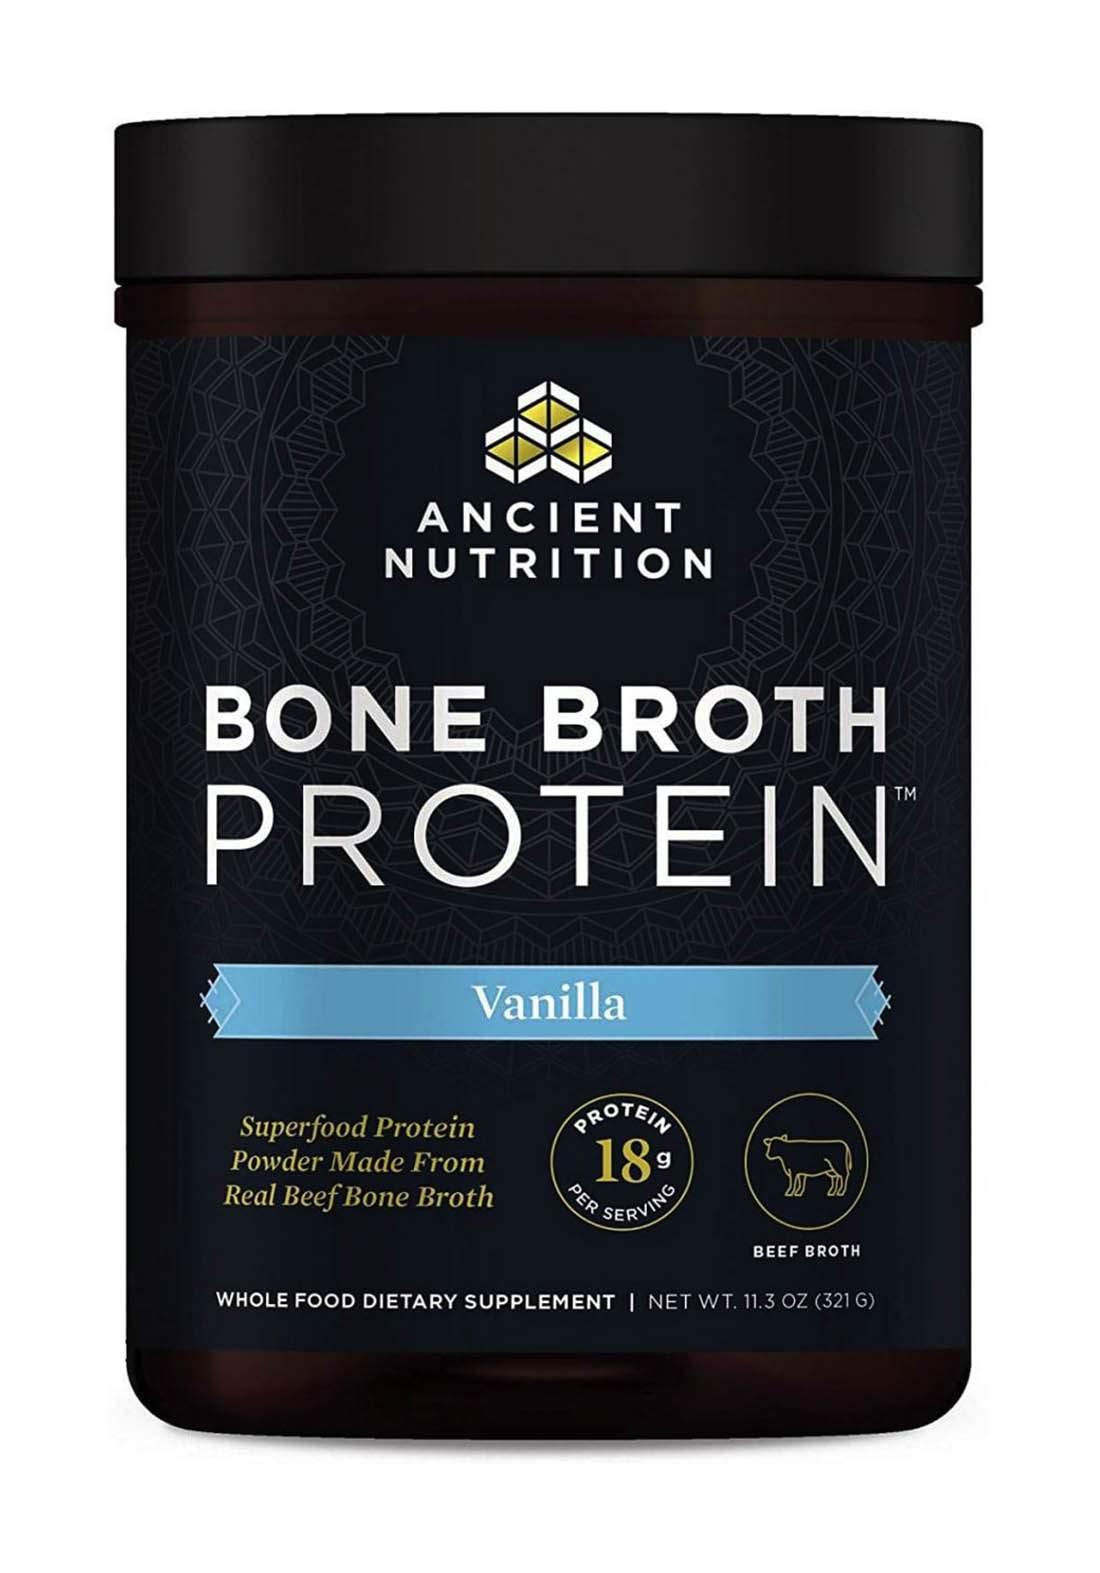 Ancient Nutrition Bone Broth Protein Powder 321 g مكمل غذائي